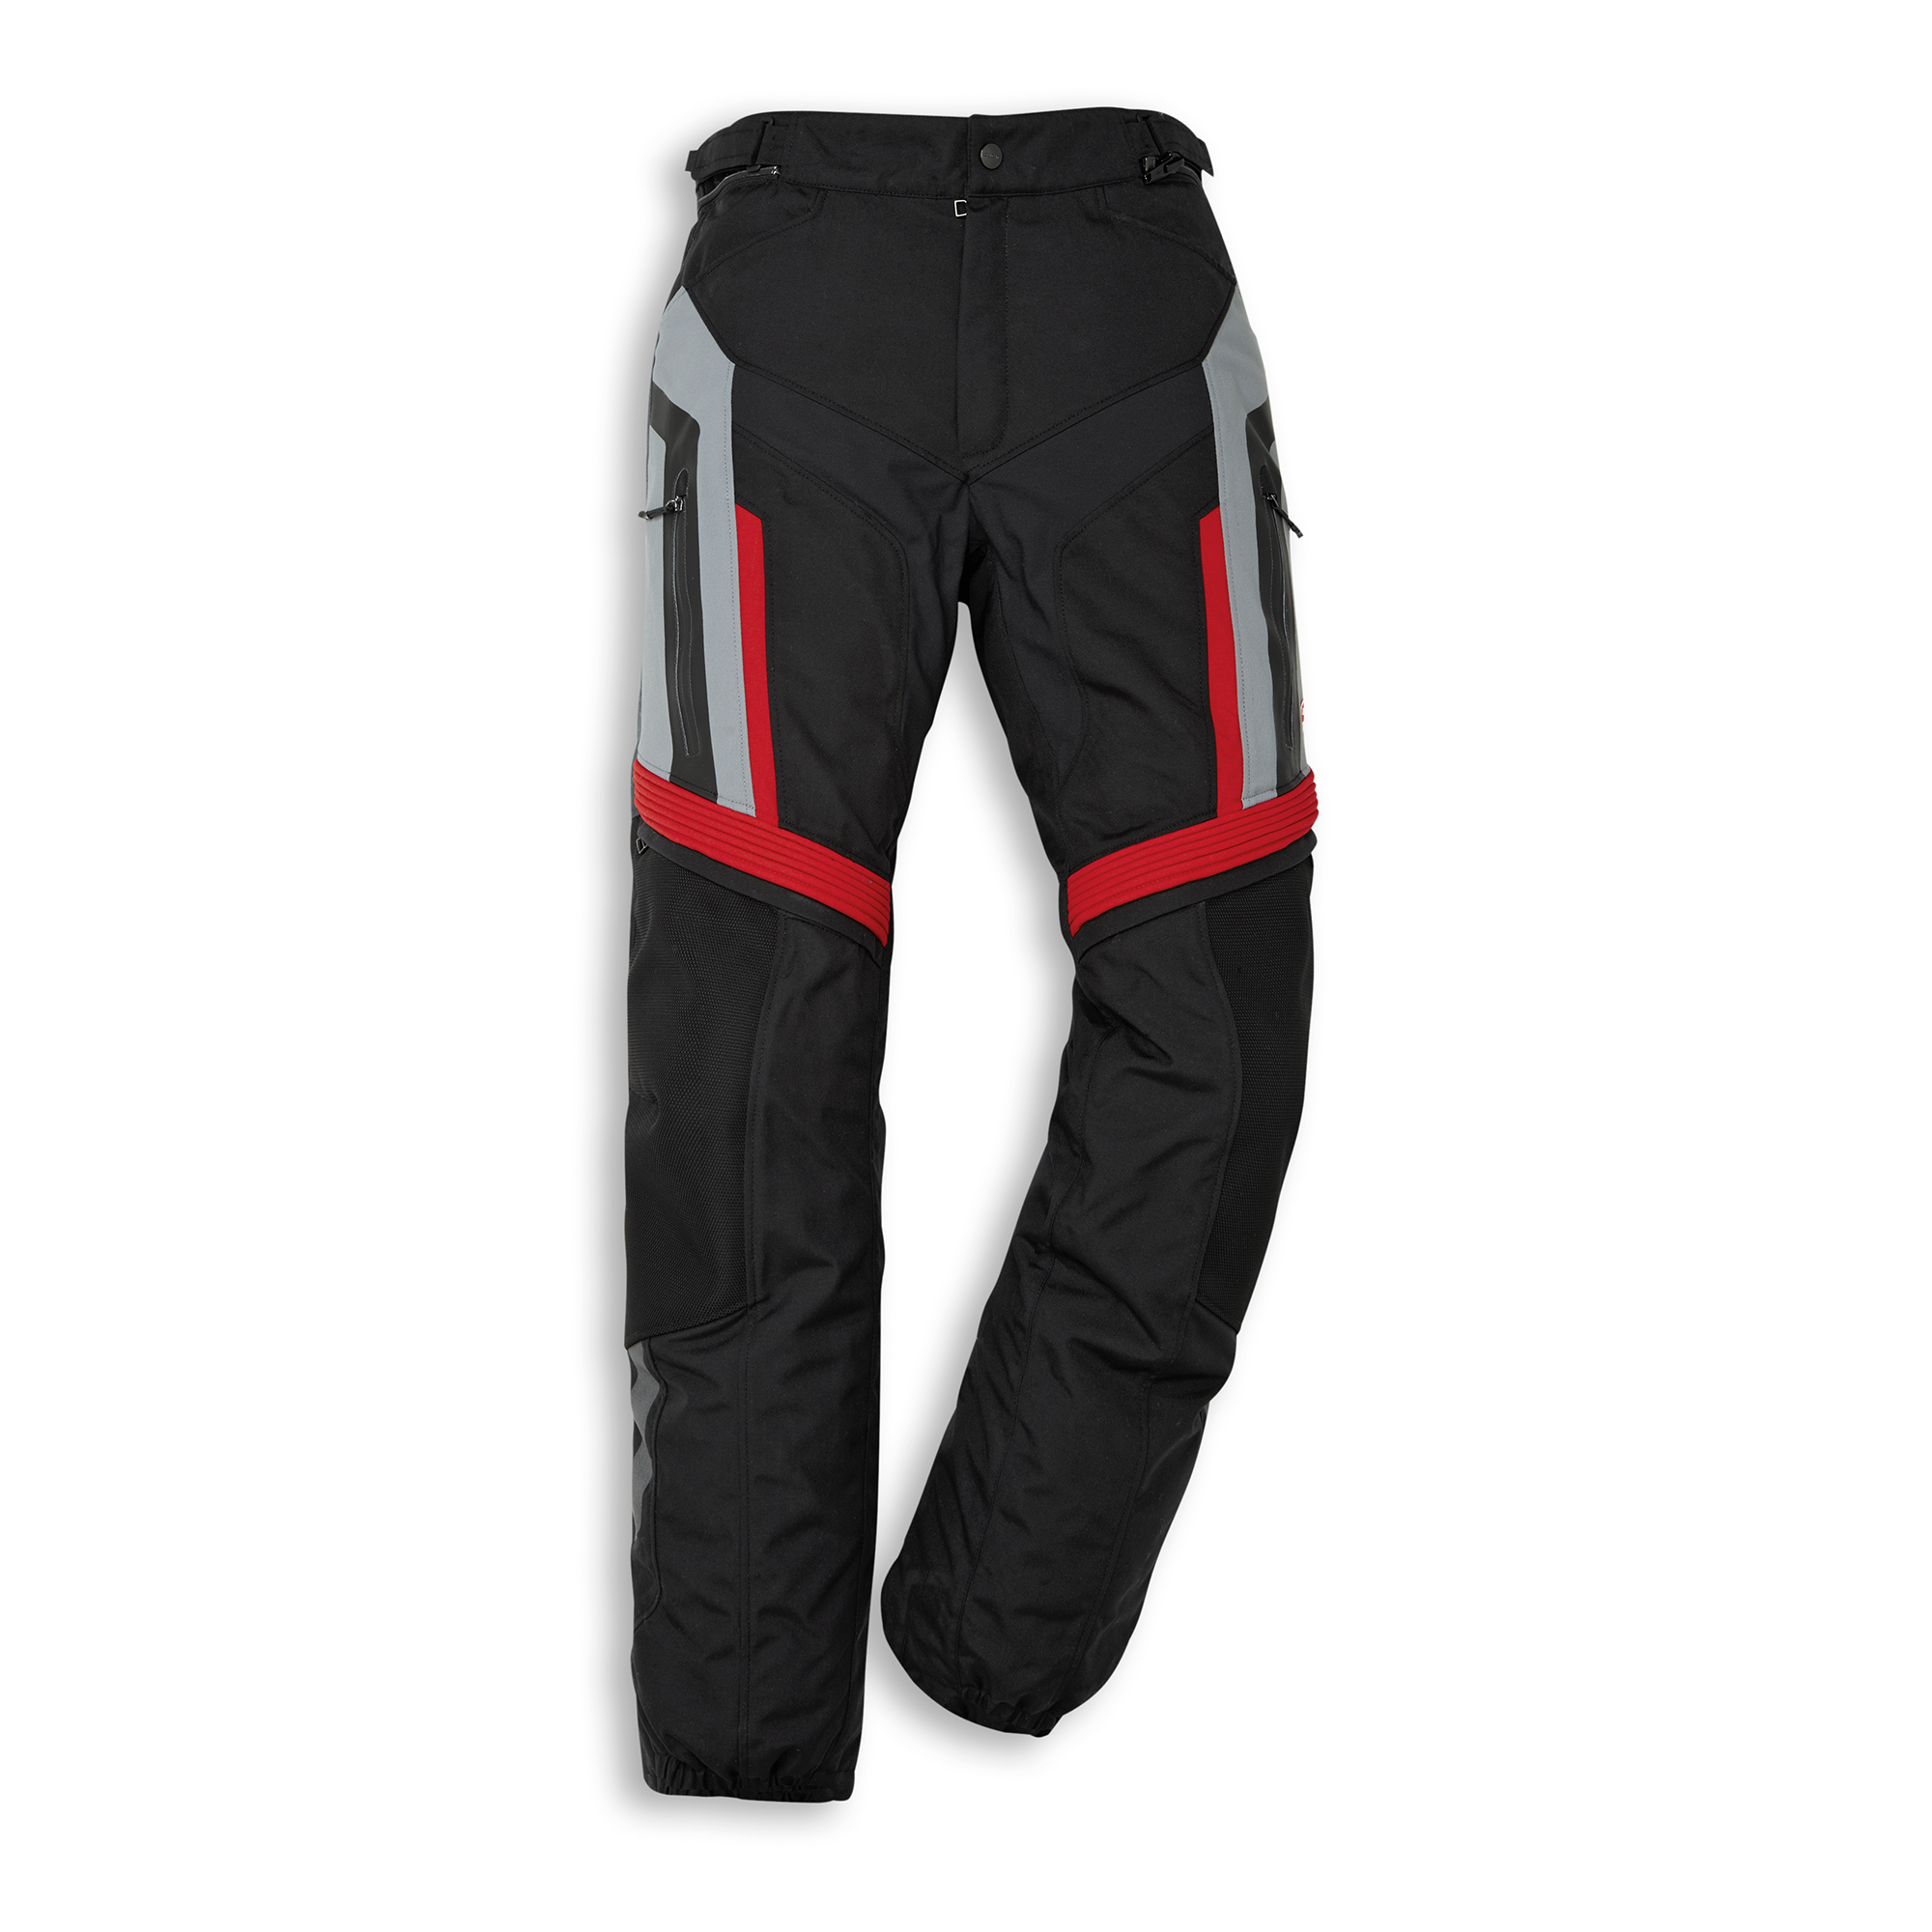 Strada C4 - Fabric trousers 9810701